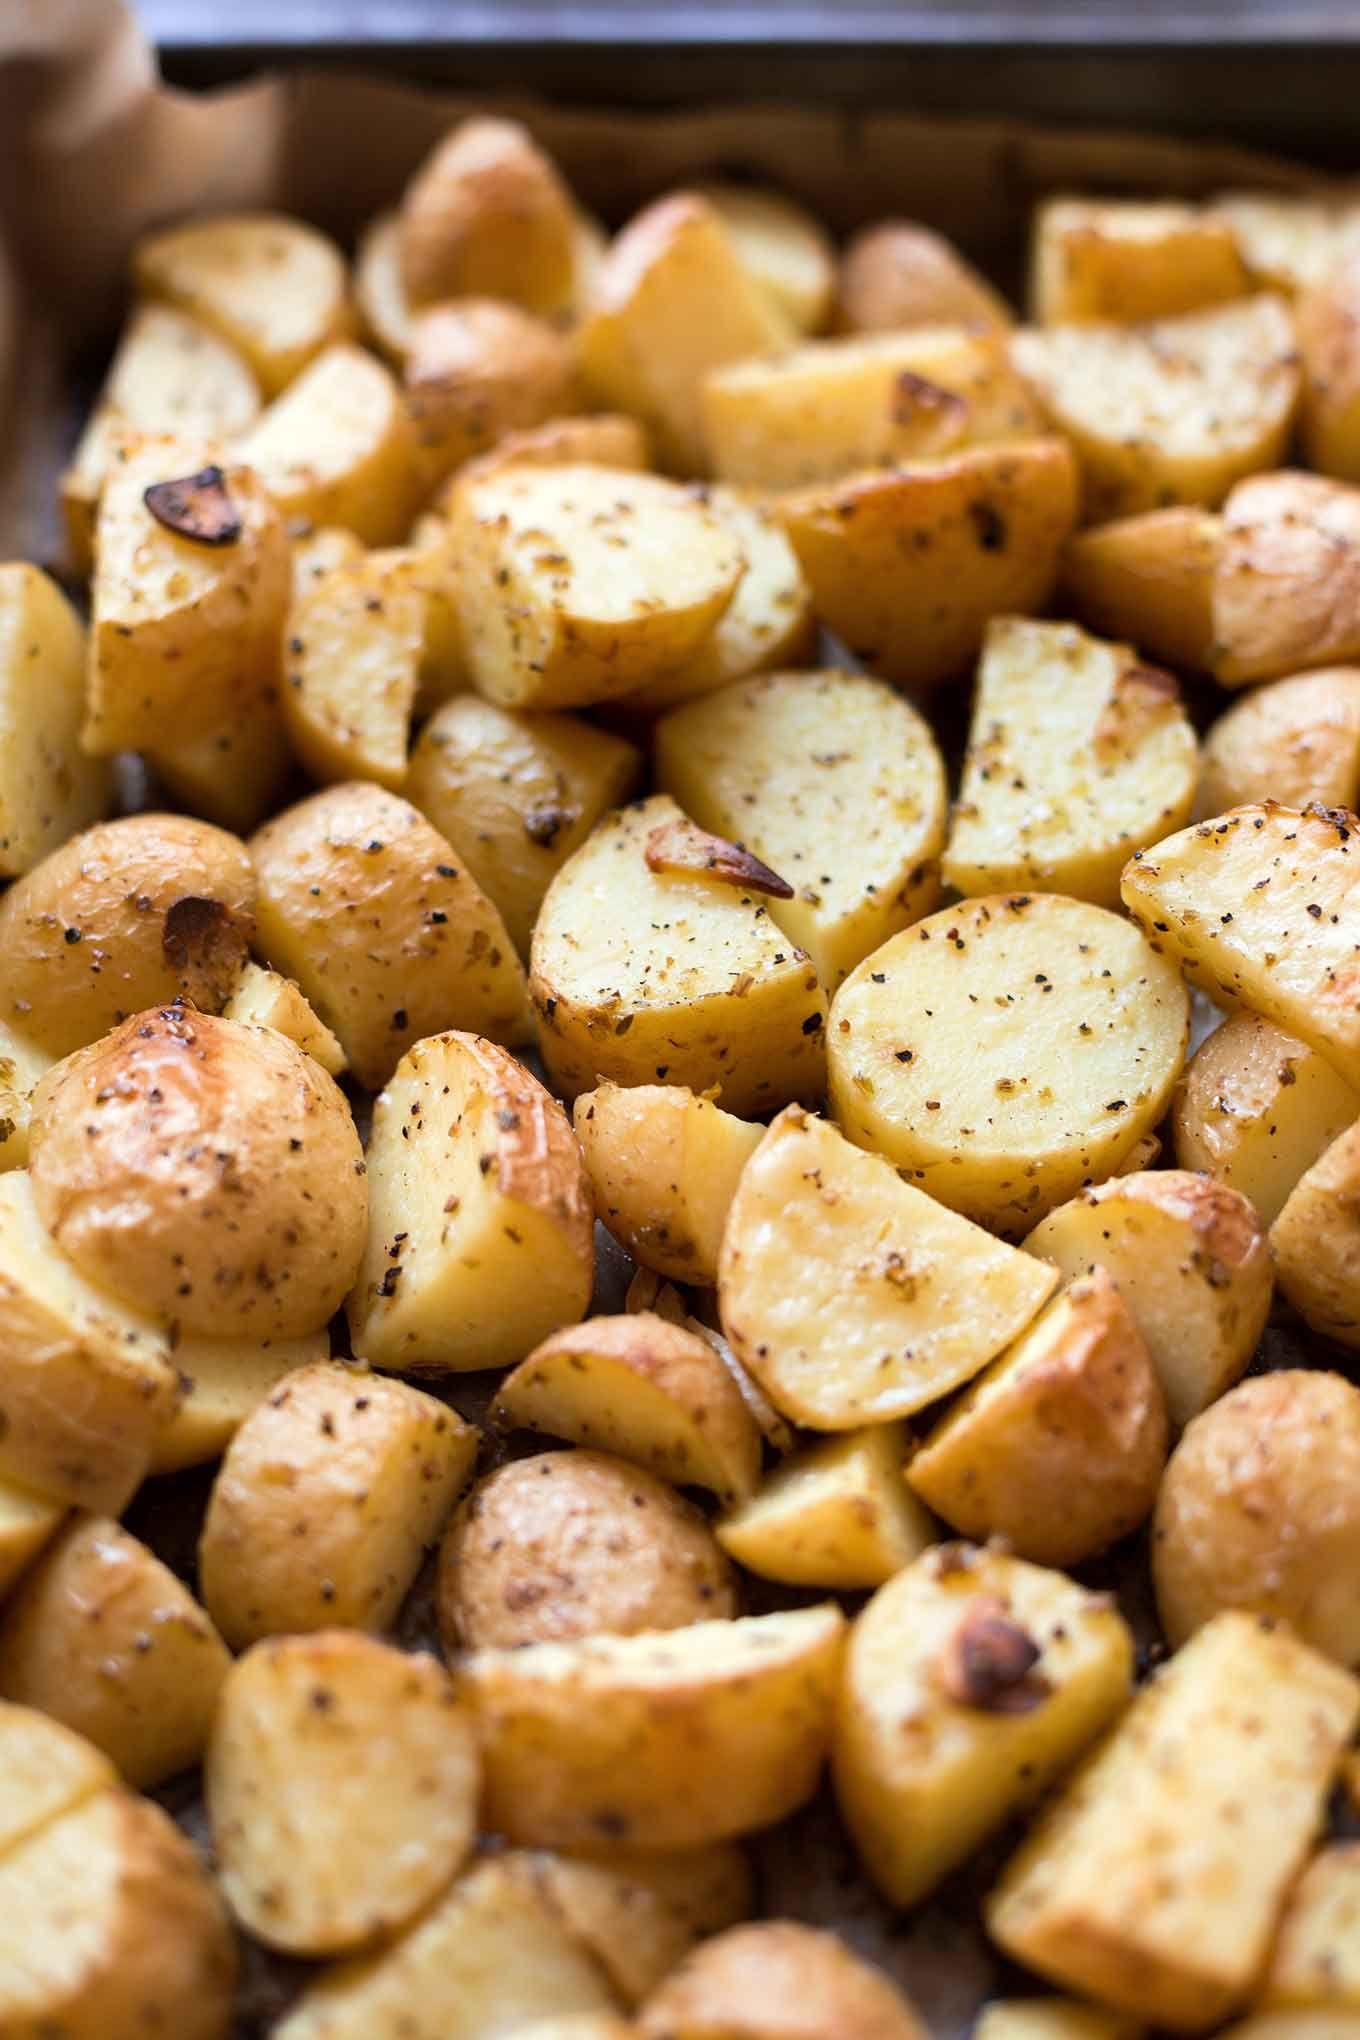 1dc16f95c00bd07cd271d1d5e9f0eb9d - Rezepte Ofenkartoffeln